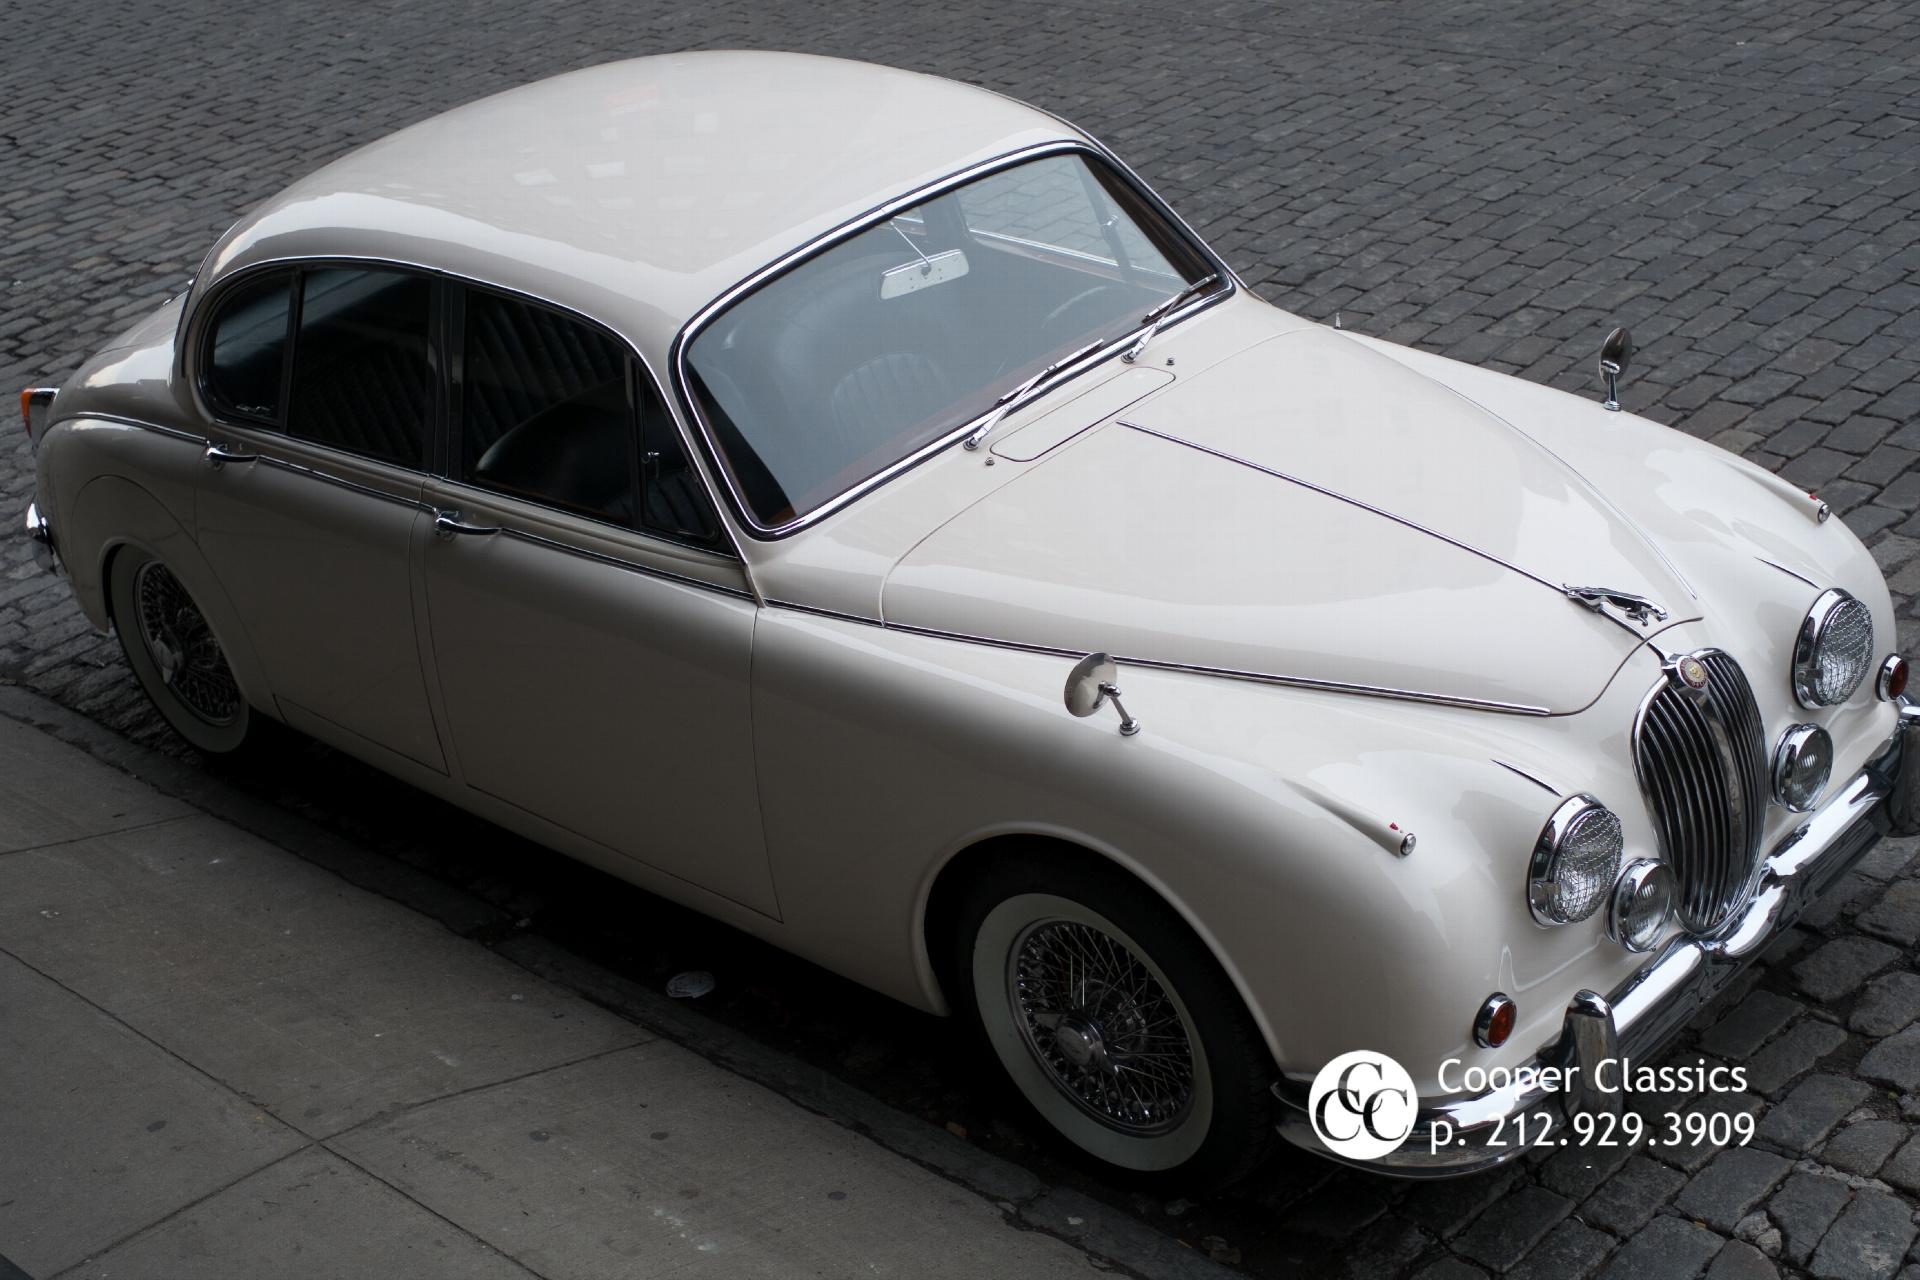 1964 Jaguar Mark 2 Stock # 692 for sale near New York, NY ...